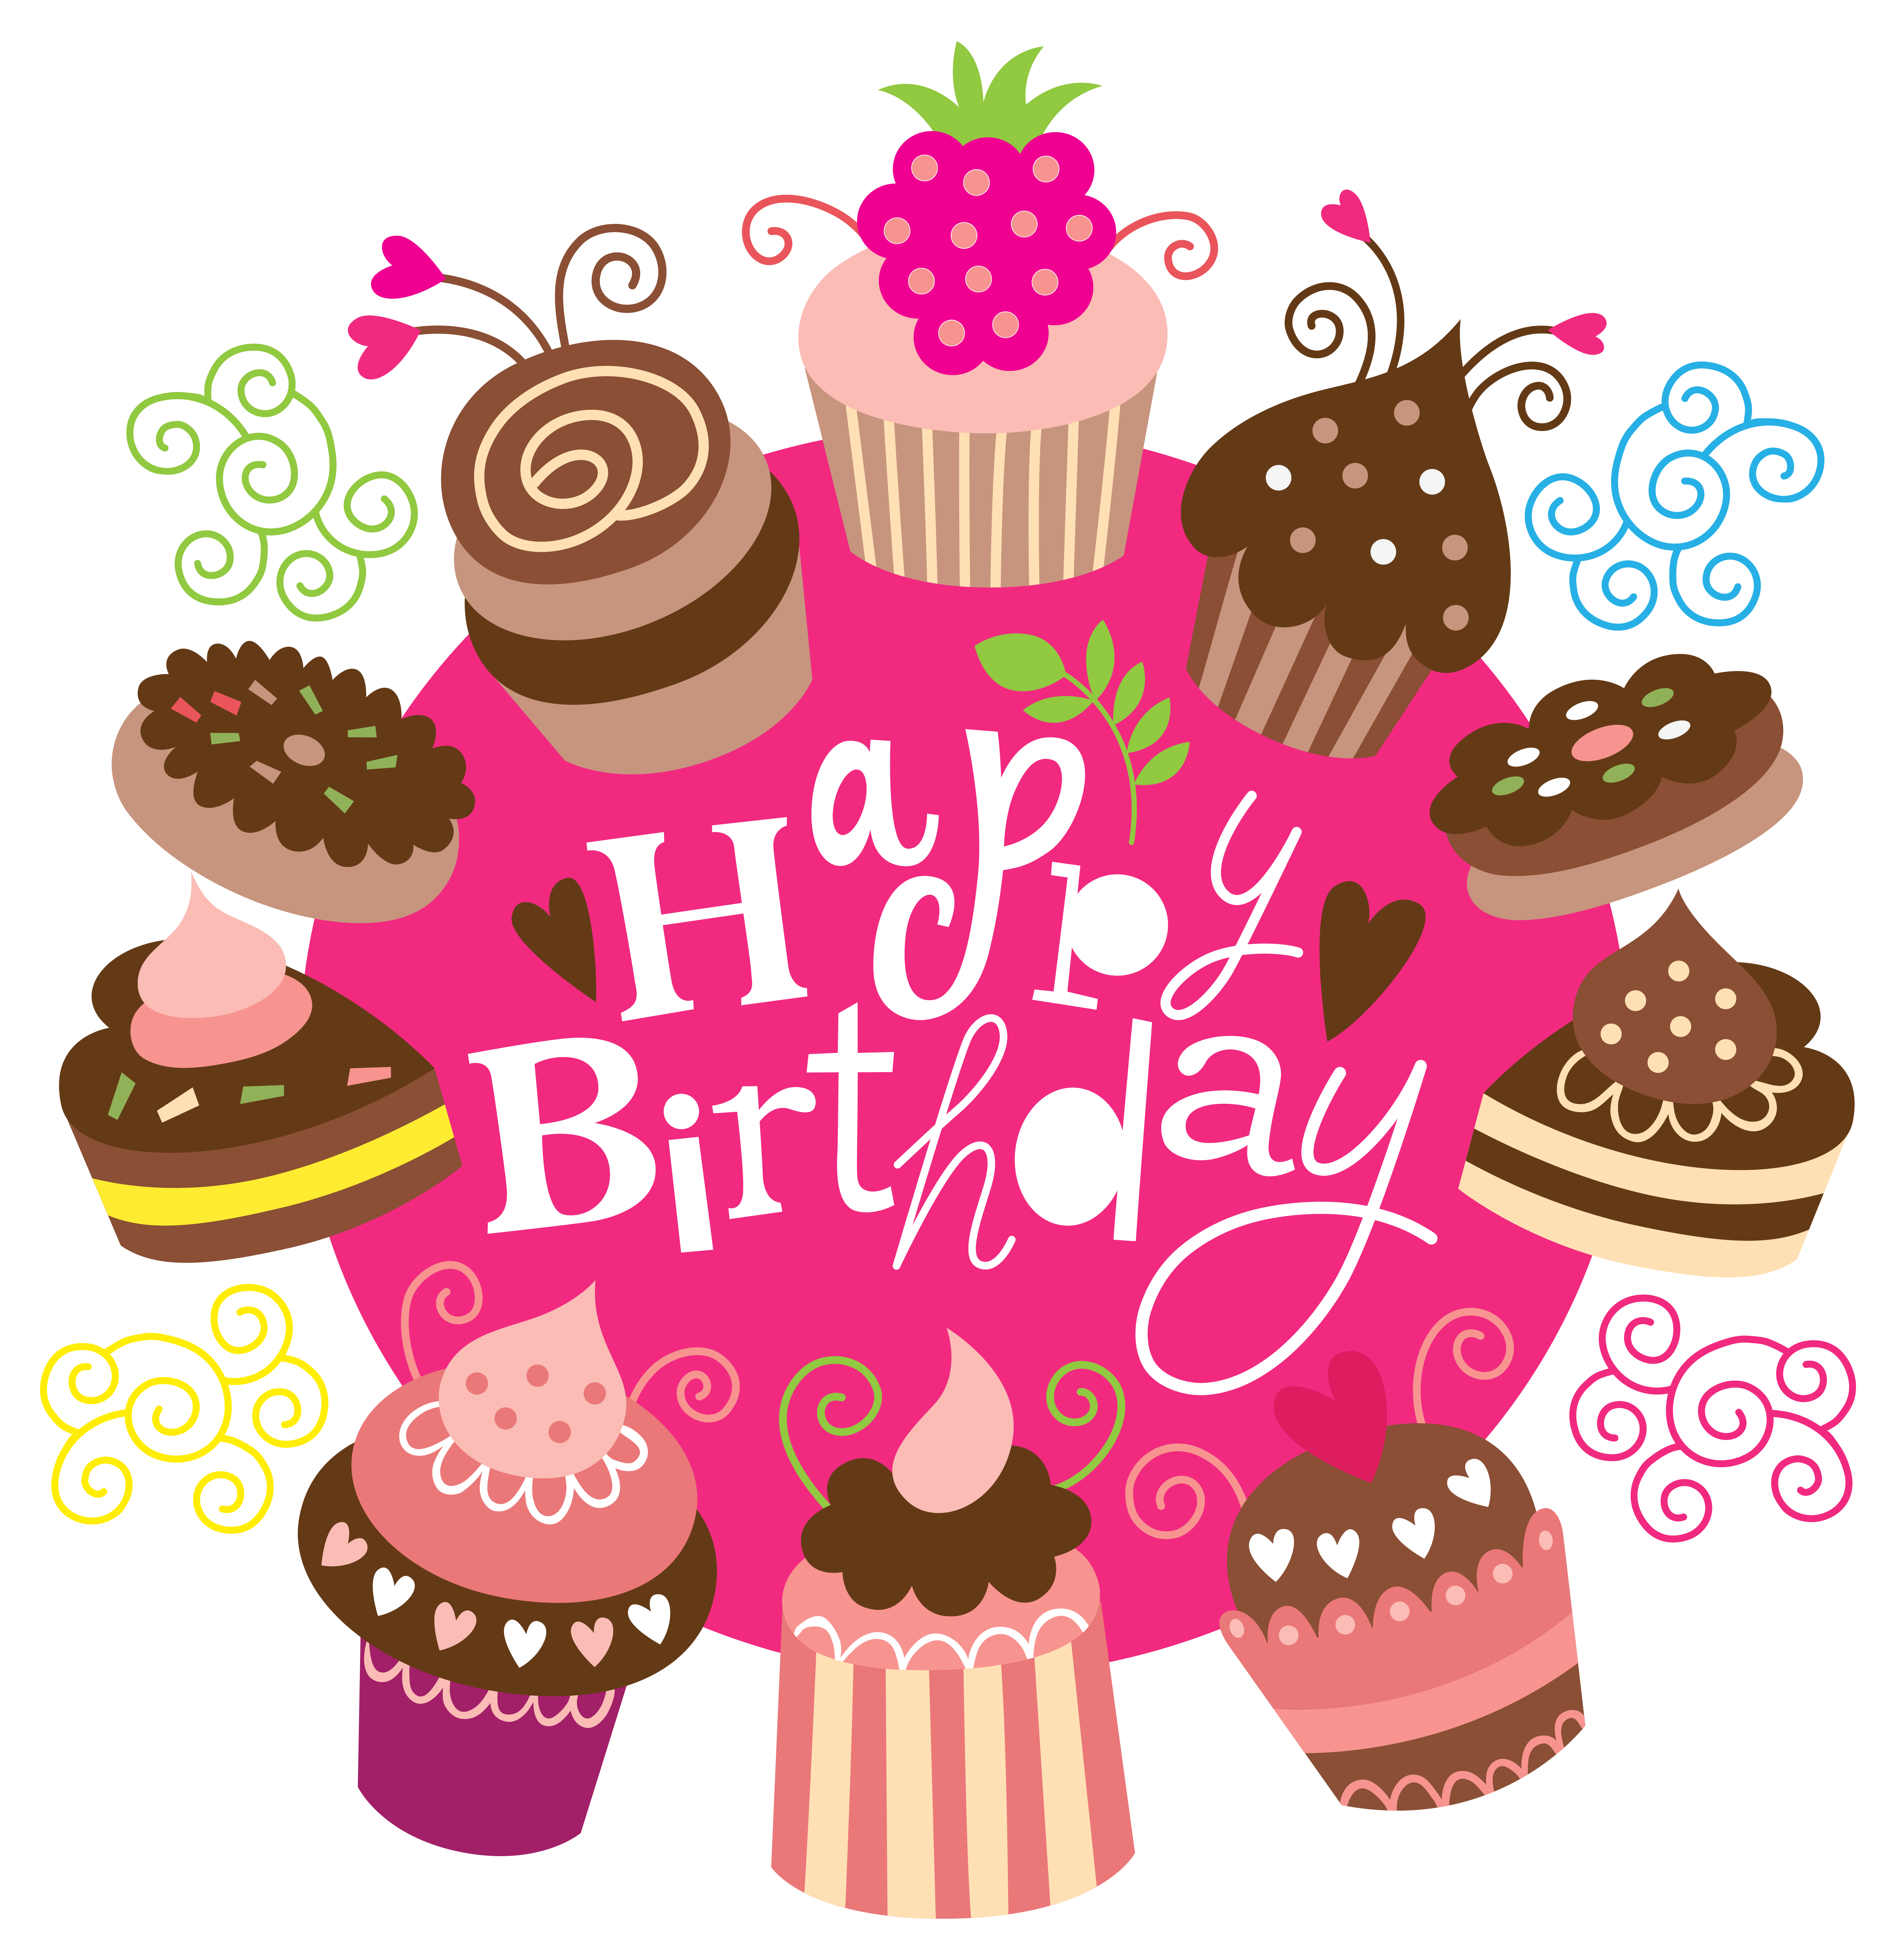 Clipart Happy Birthday & Happy Birthday Clip Art Images.